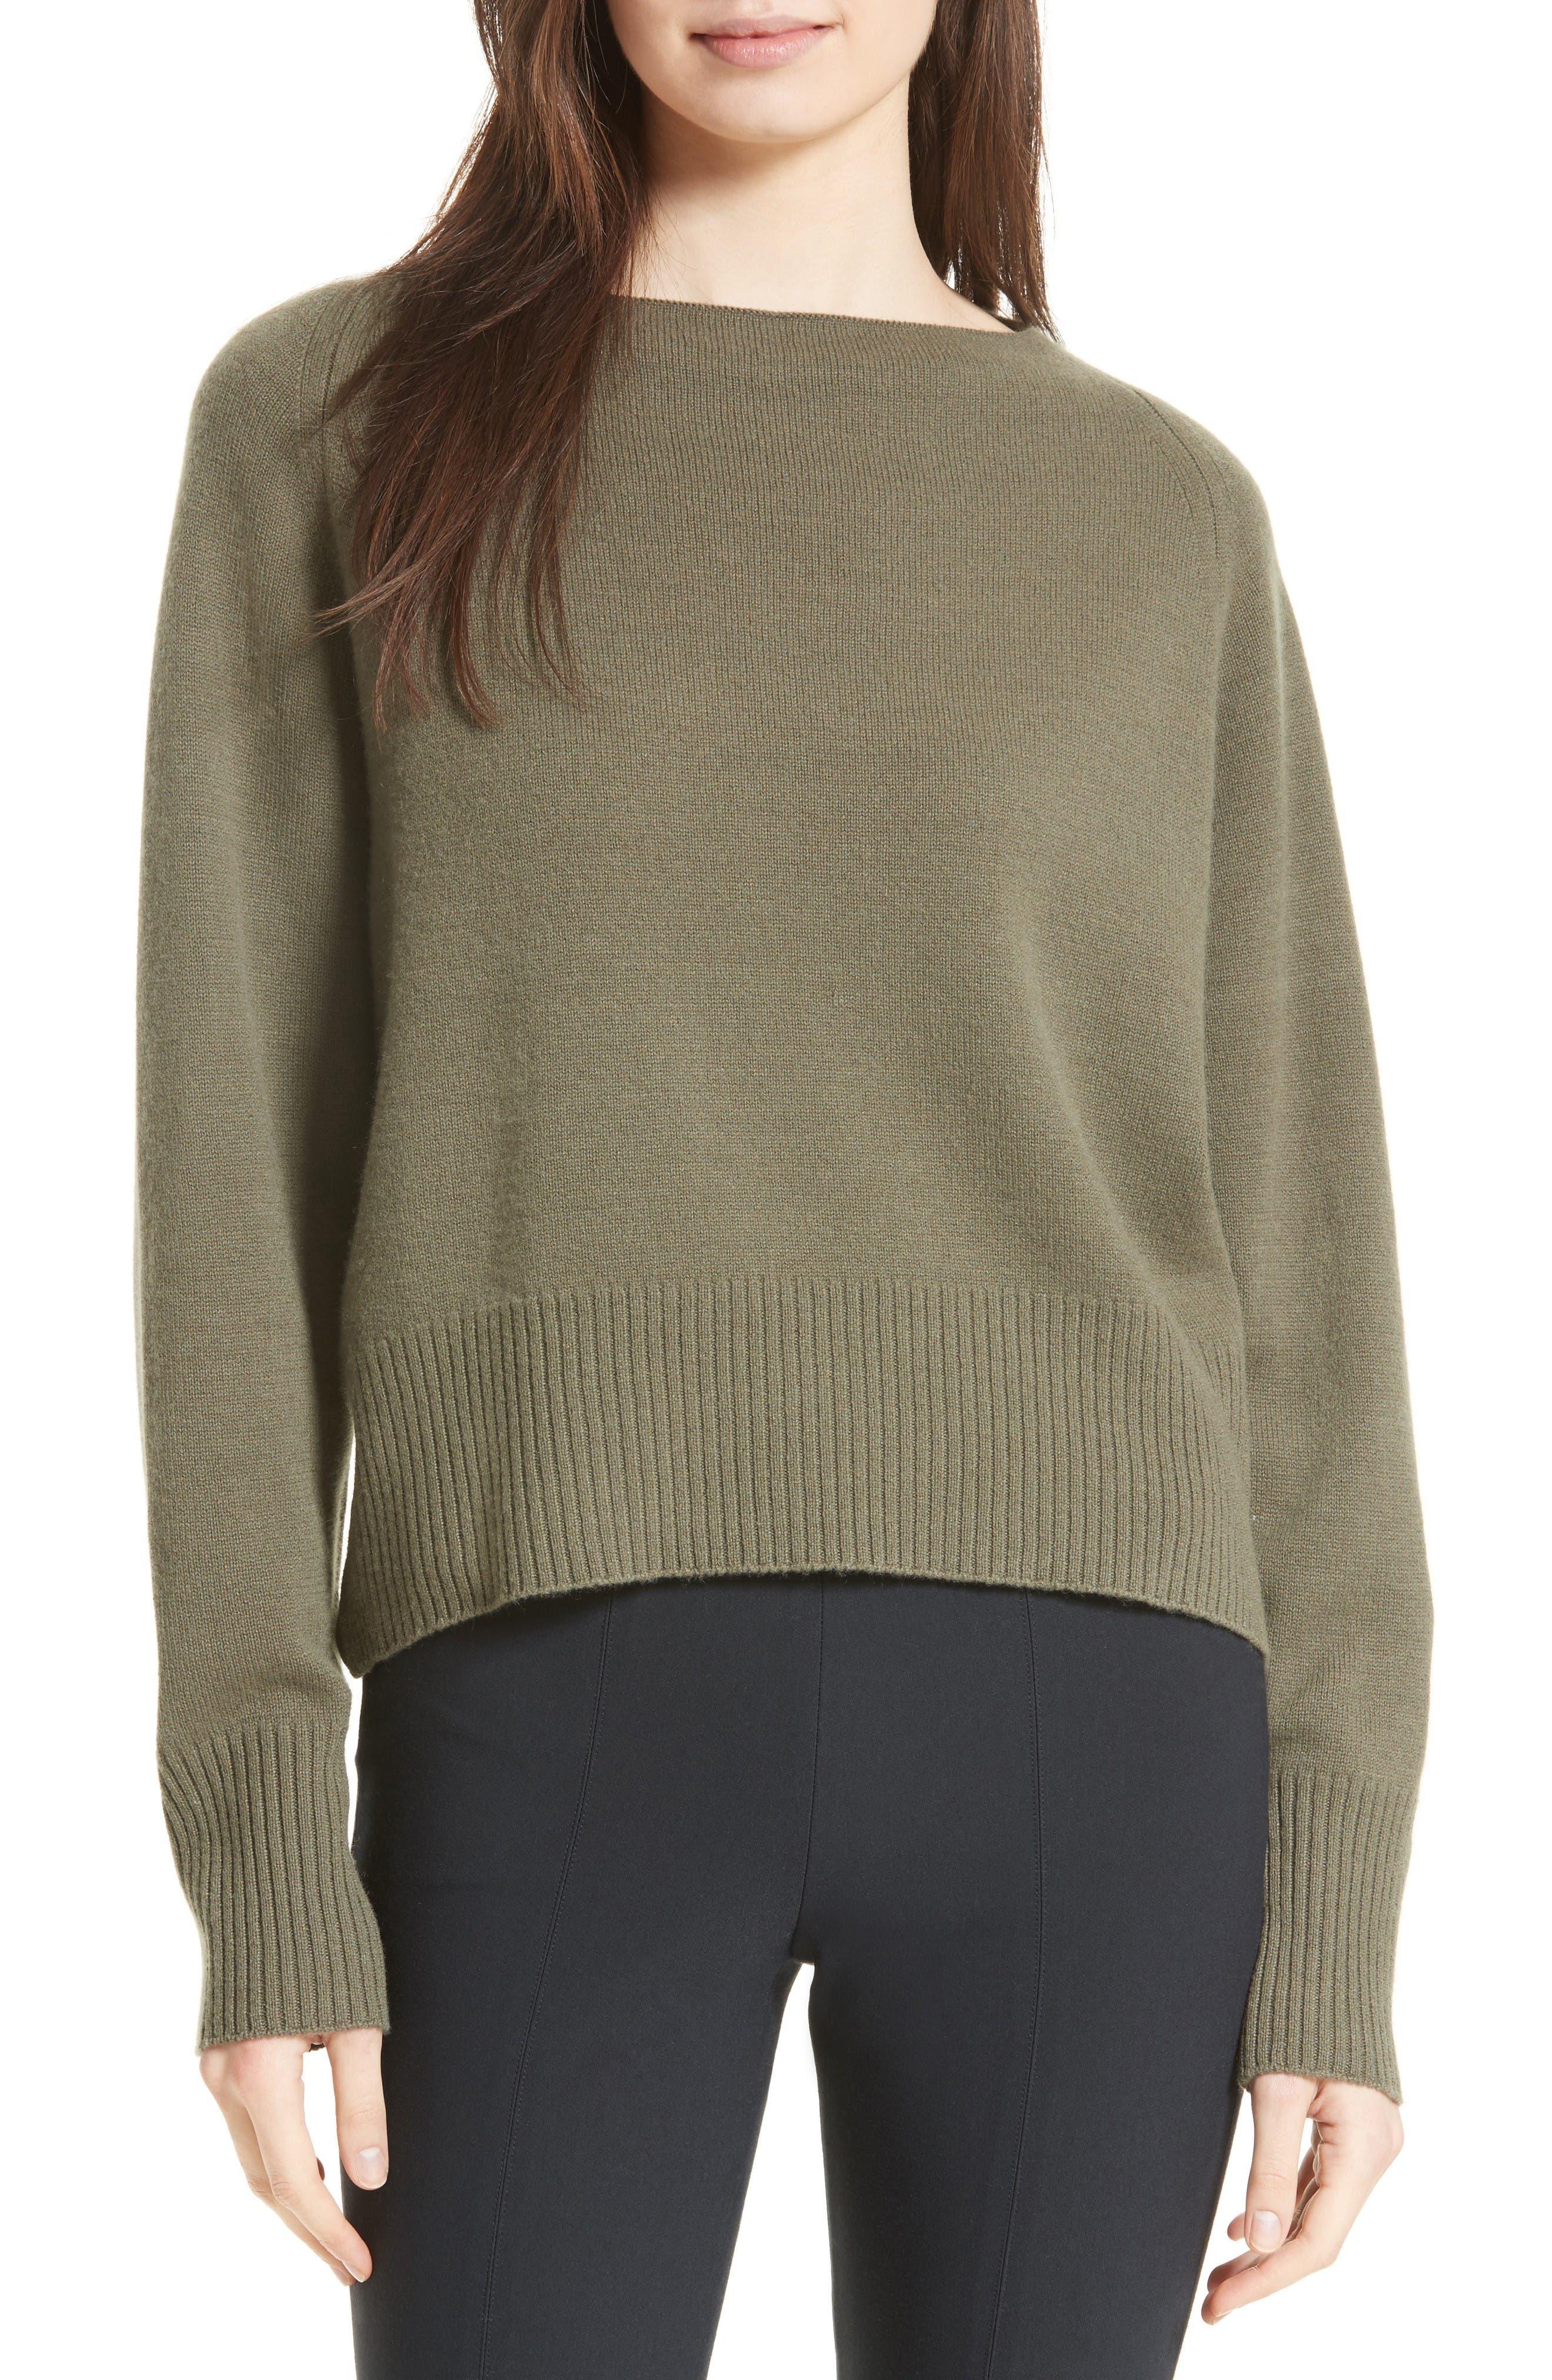 Alternate Image 1 Selected - Vince Boat Neck Cashmere Sweater